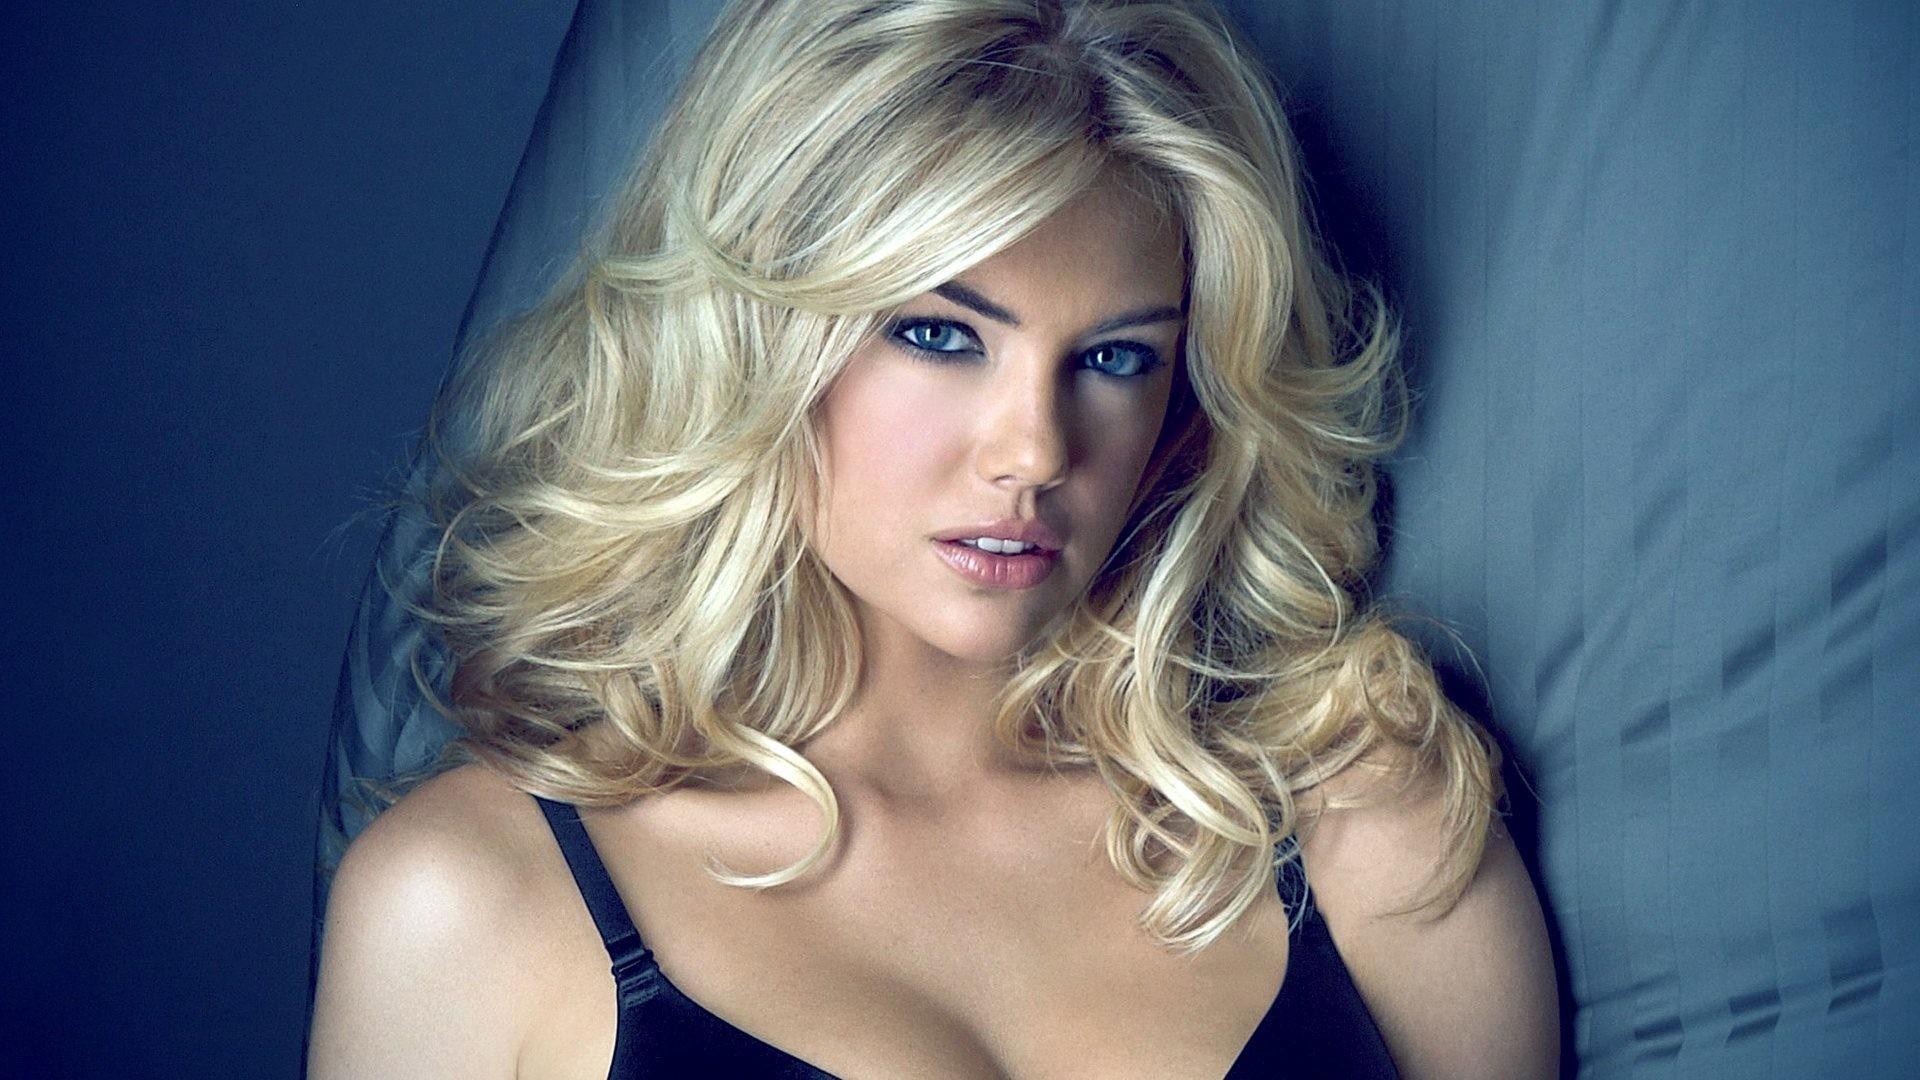 Image: Kate Upton Beauty Face Wallpaper